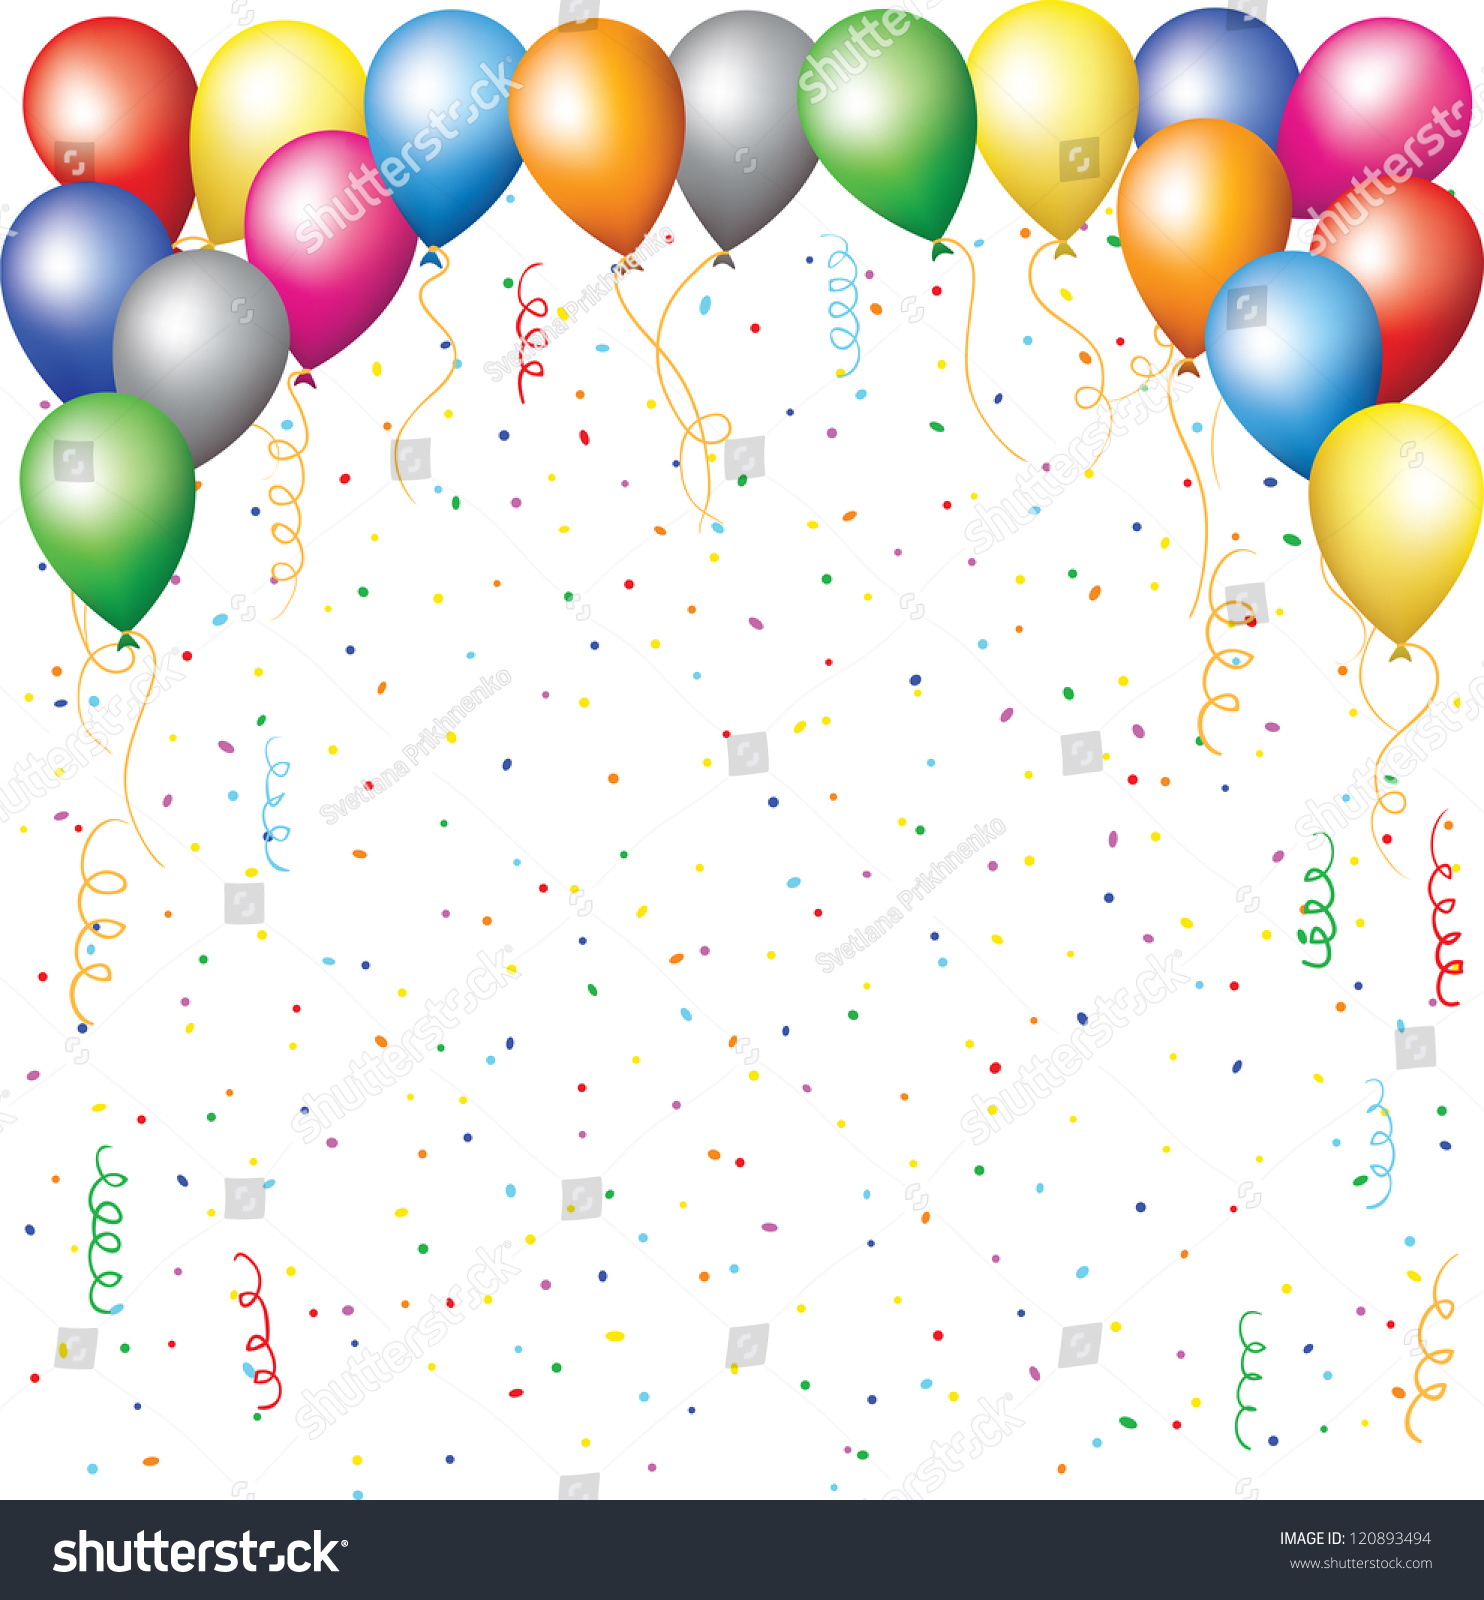 Happy Birthday Background Balloons Confetti Serpentine